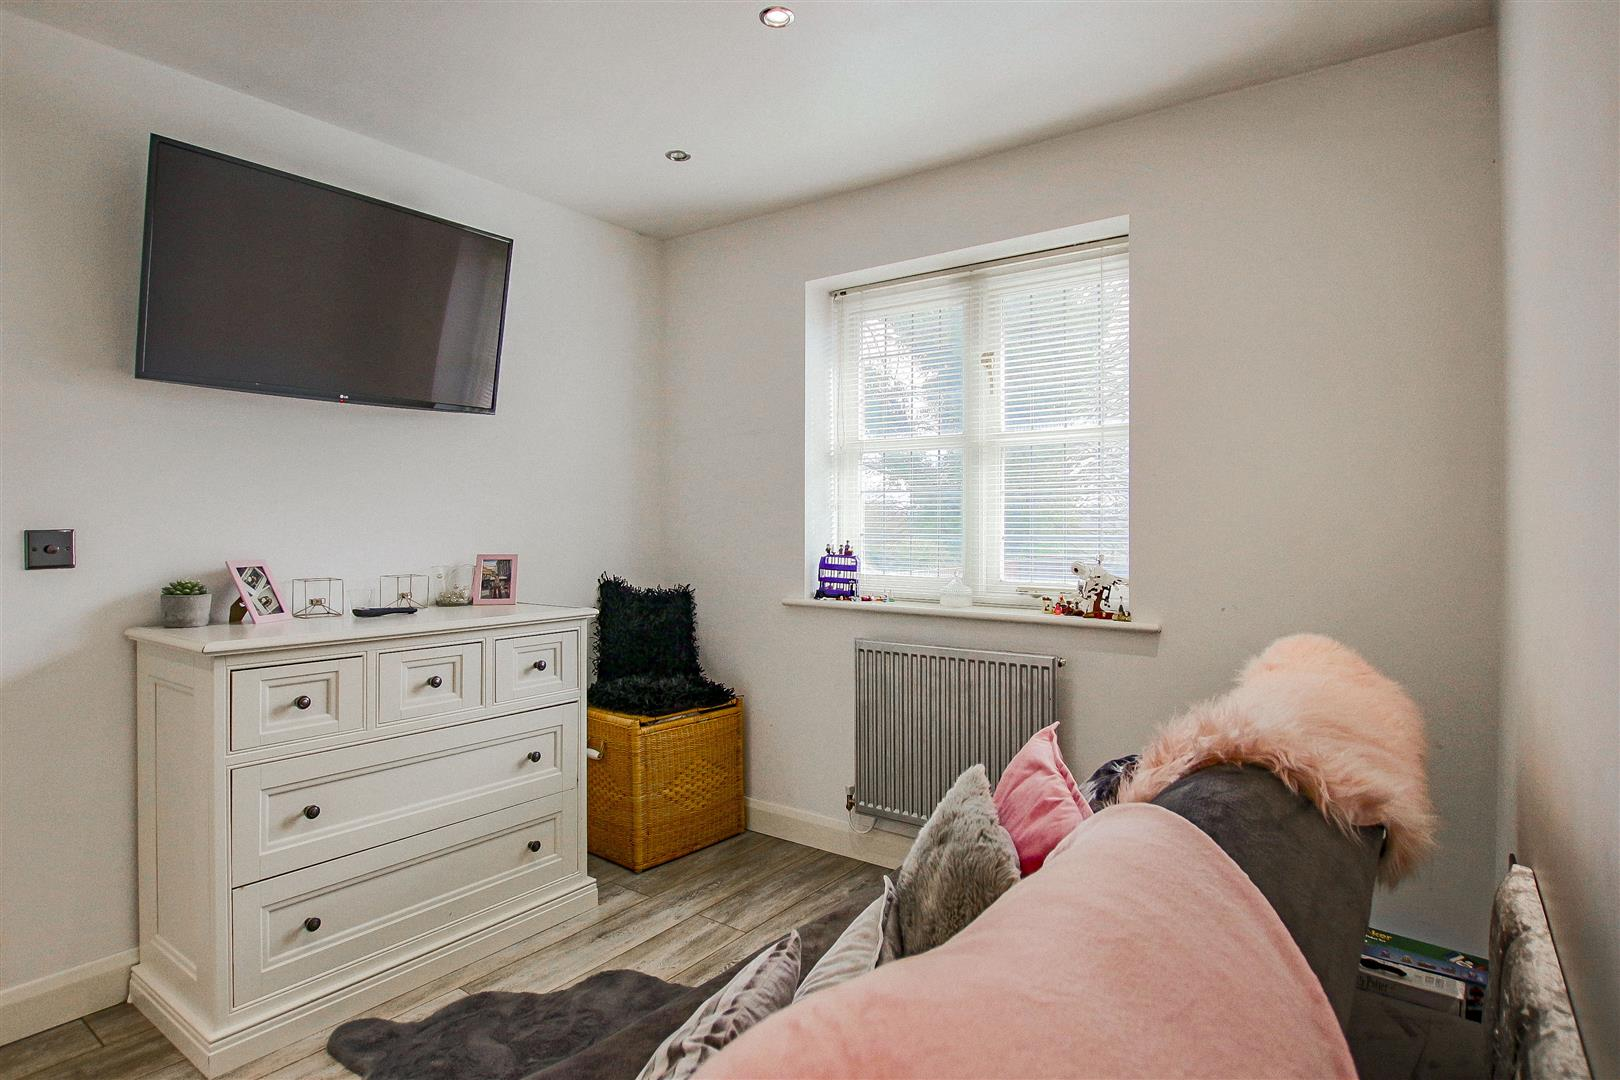 4 Bedroom Detached House For Sale - redwing31773.JPG